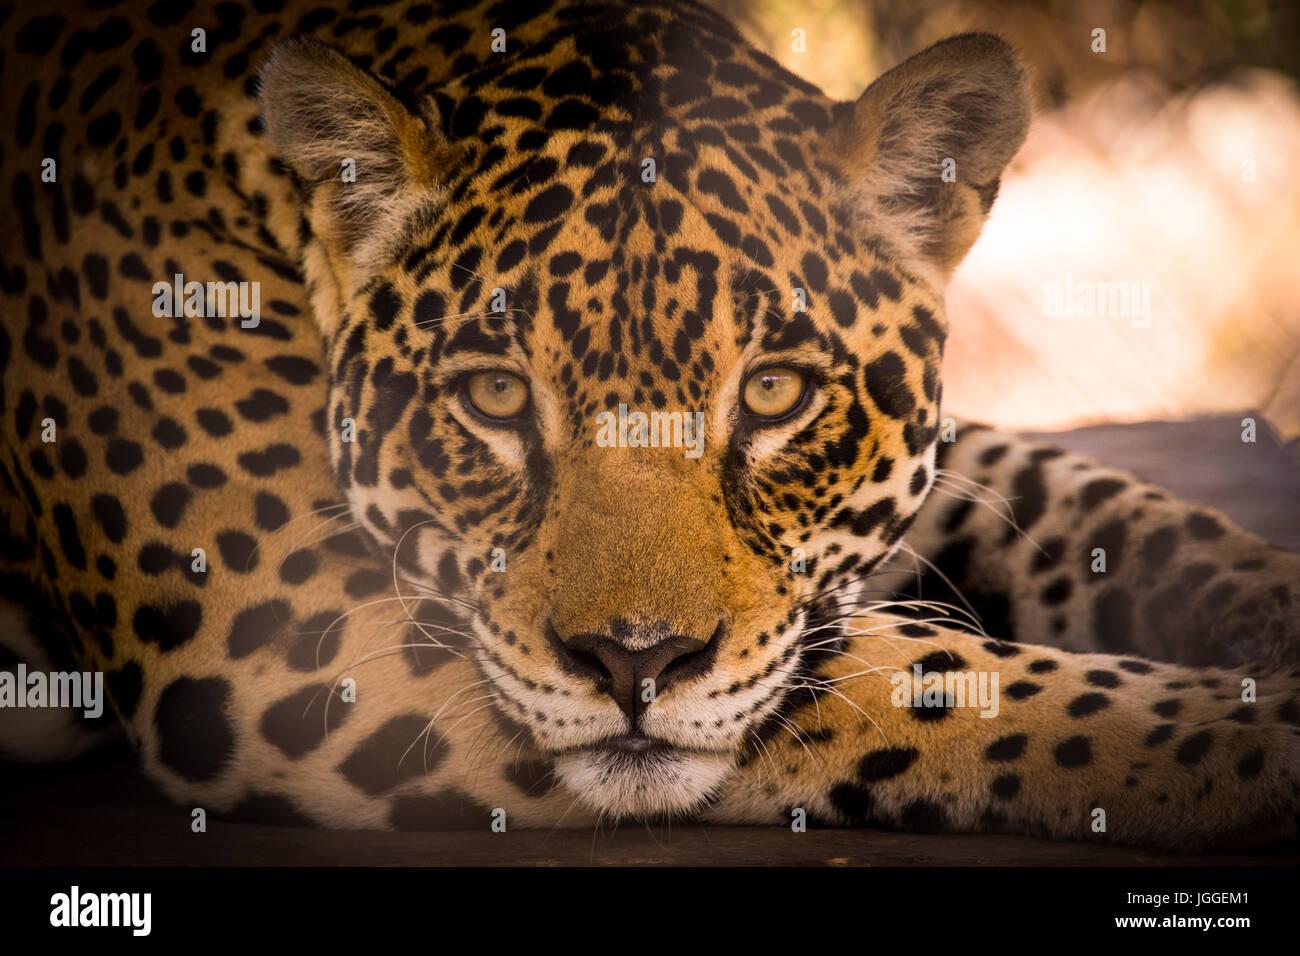 Grande gatto selvatico jaguar Panthera onca wildlife immagine presa in Panama Immagini Stock